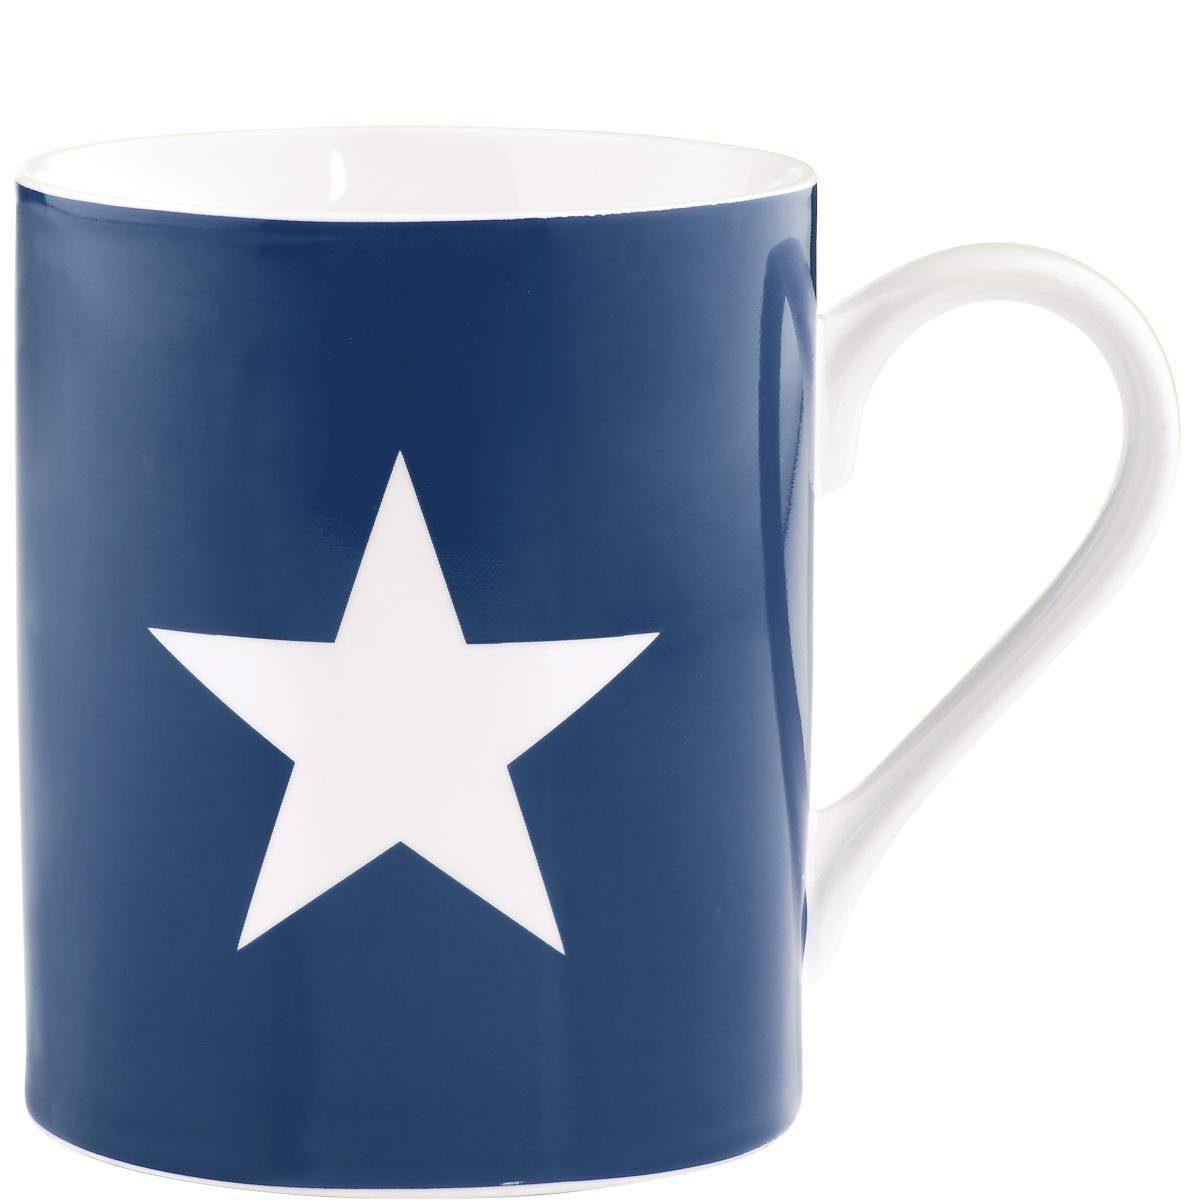 BUTLERS STARS »Tasse Stern«